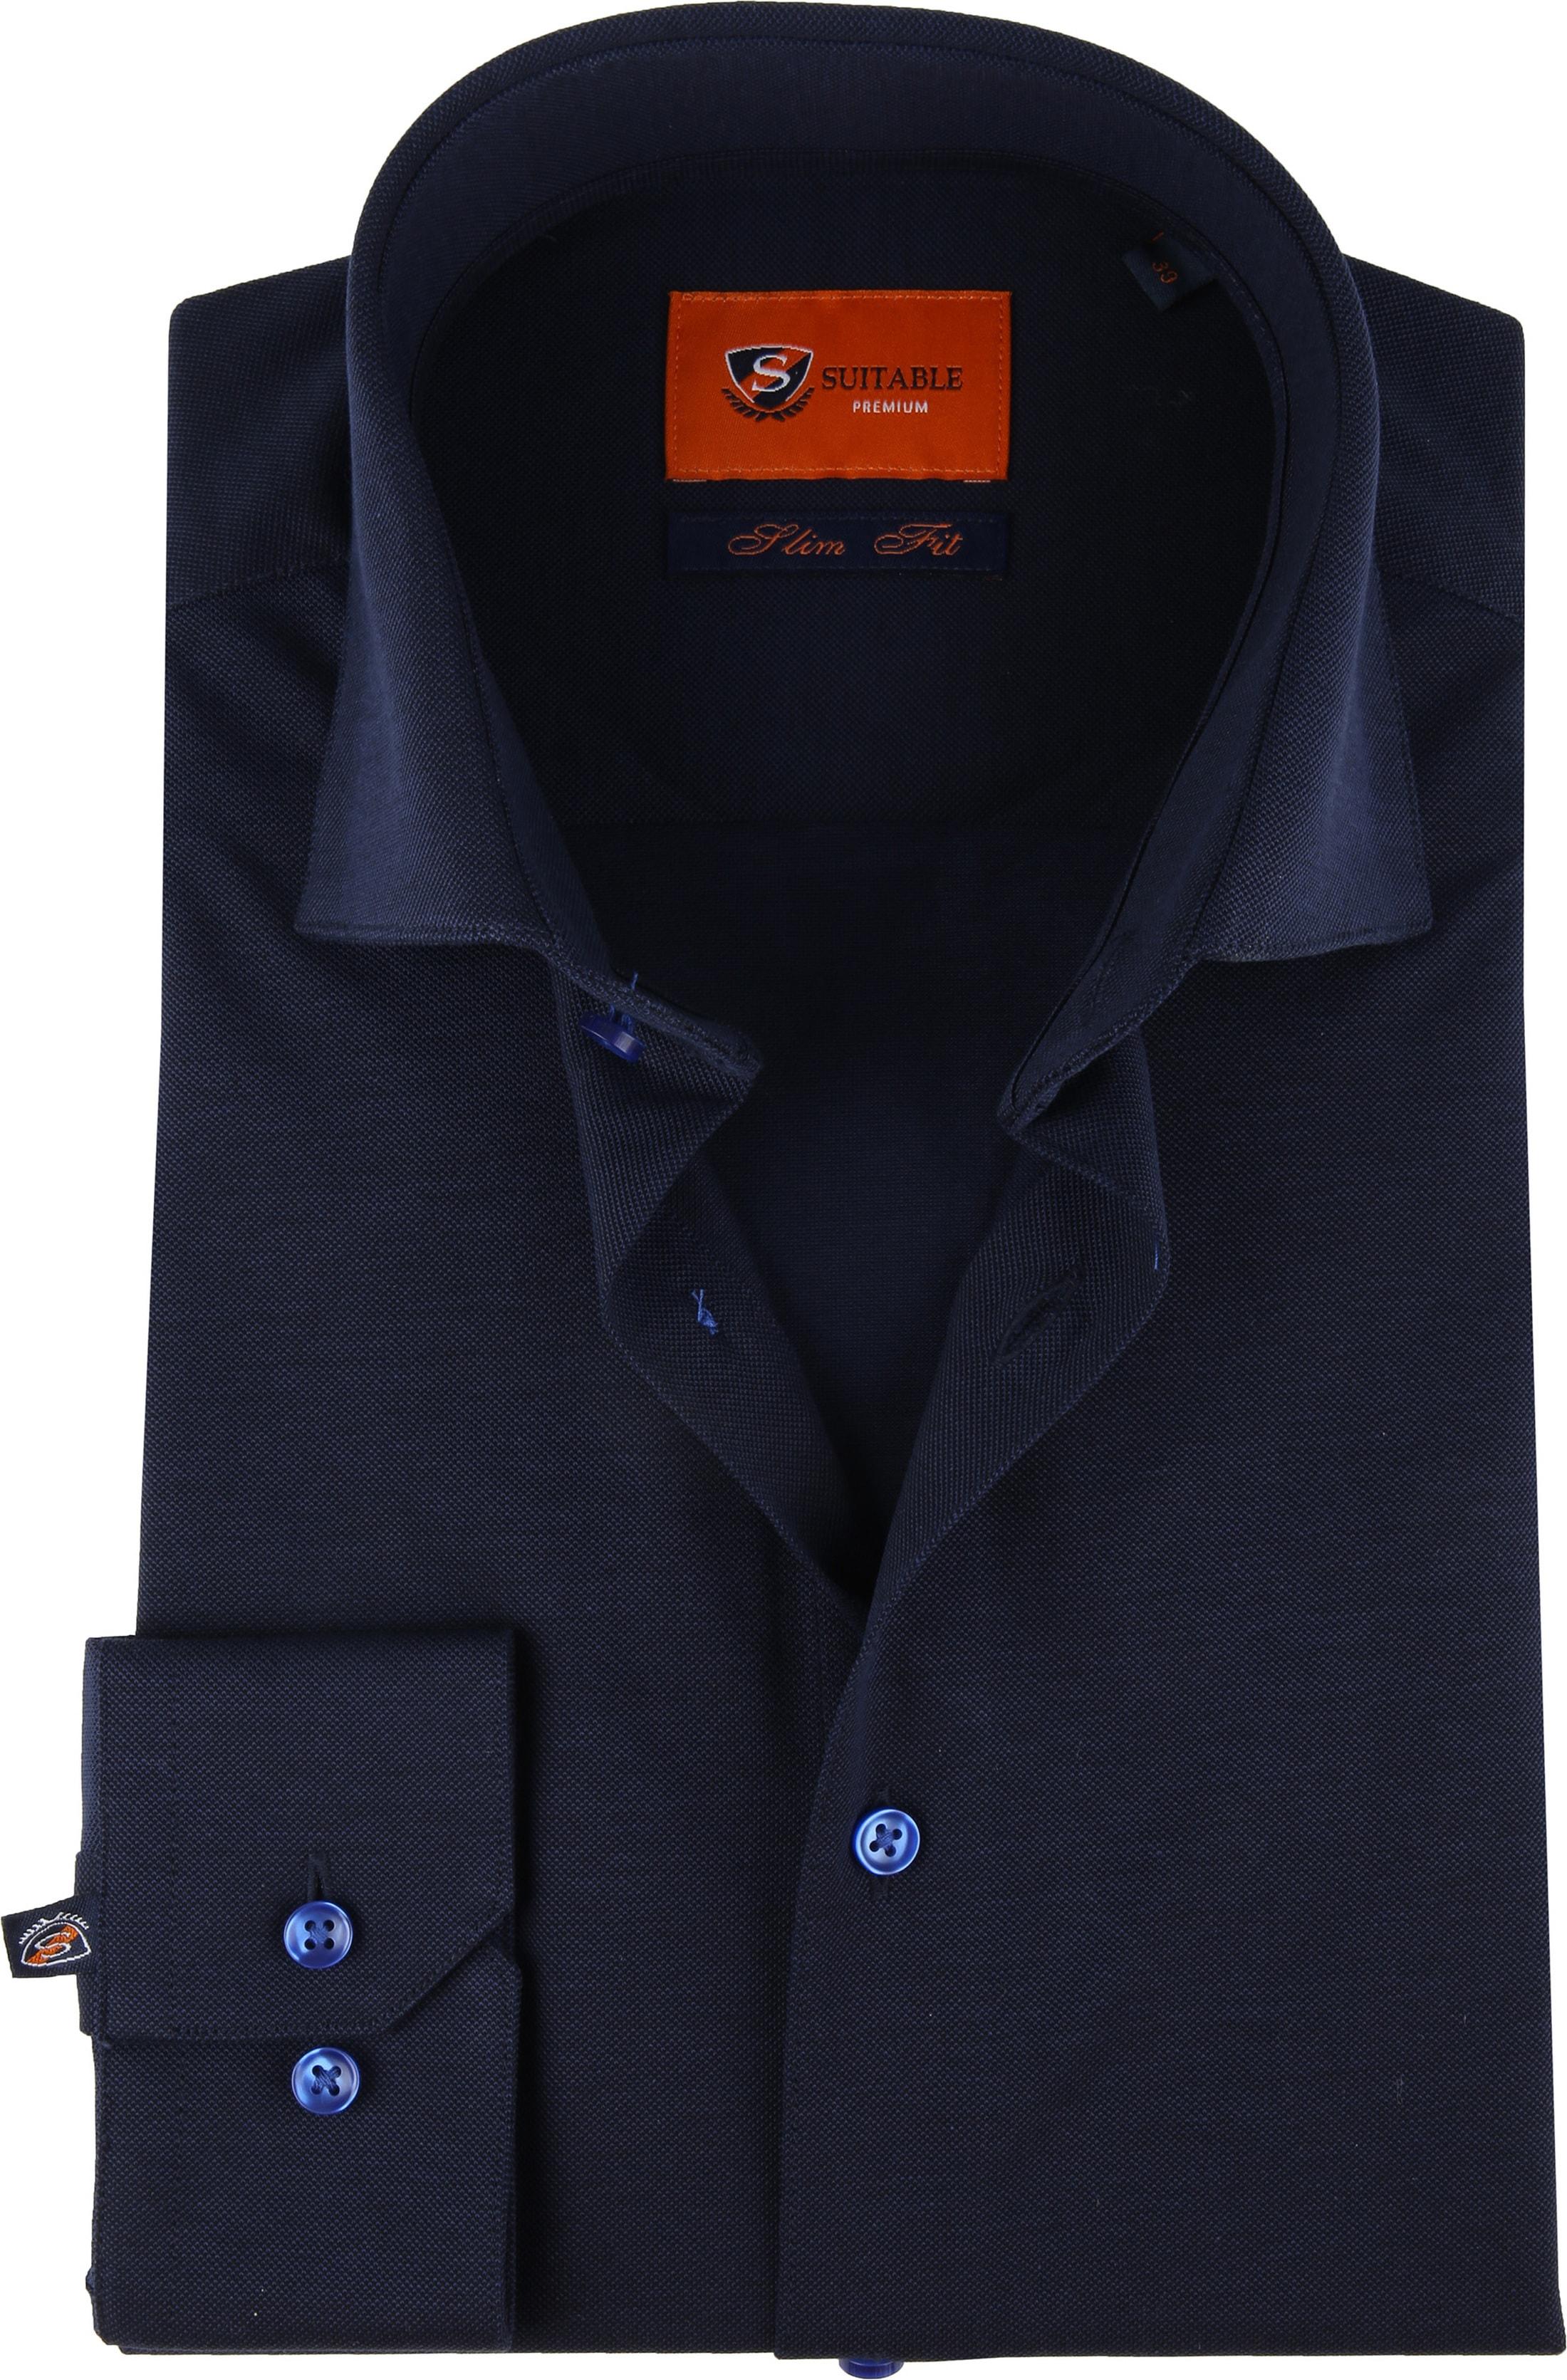 Suitable Jersey Pique Shirt Navy foto 0